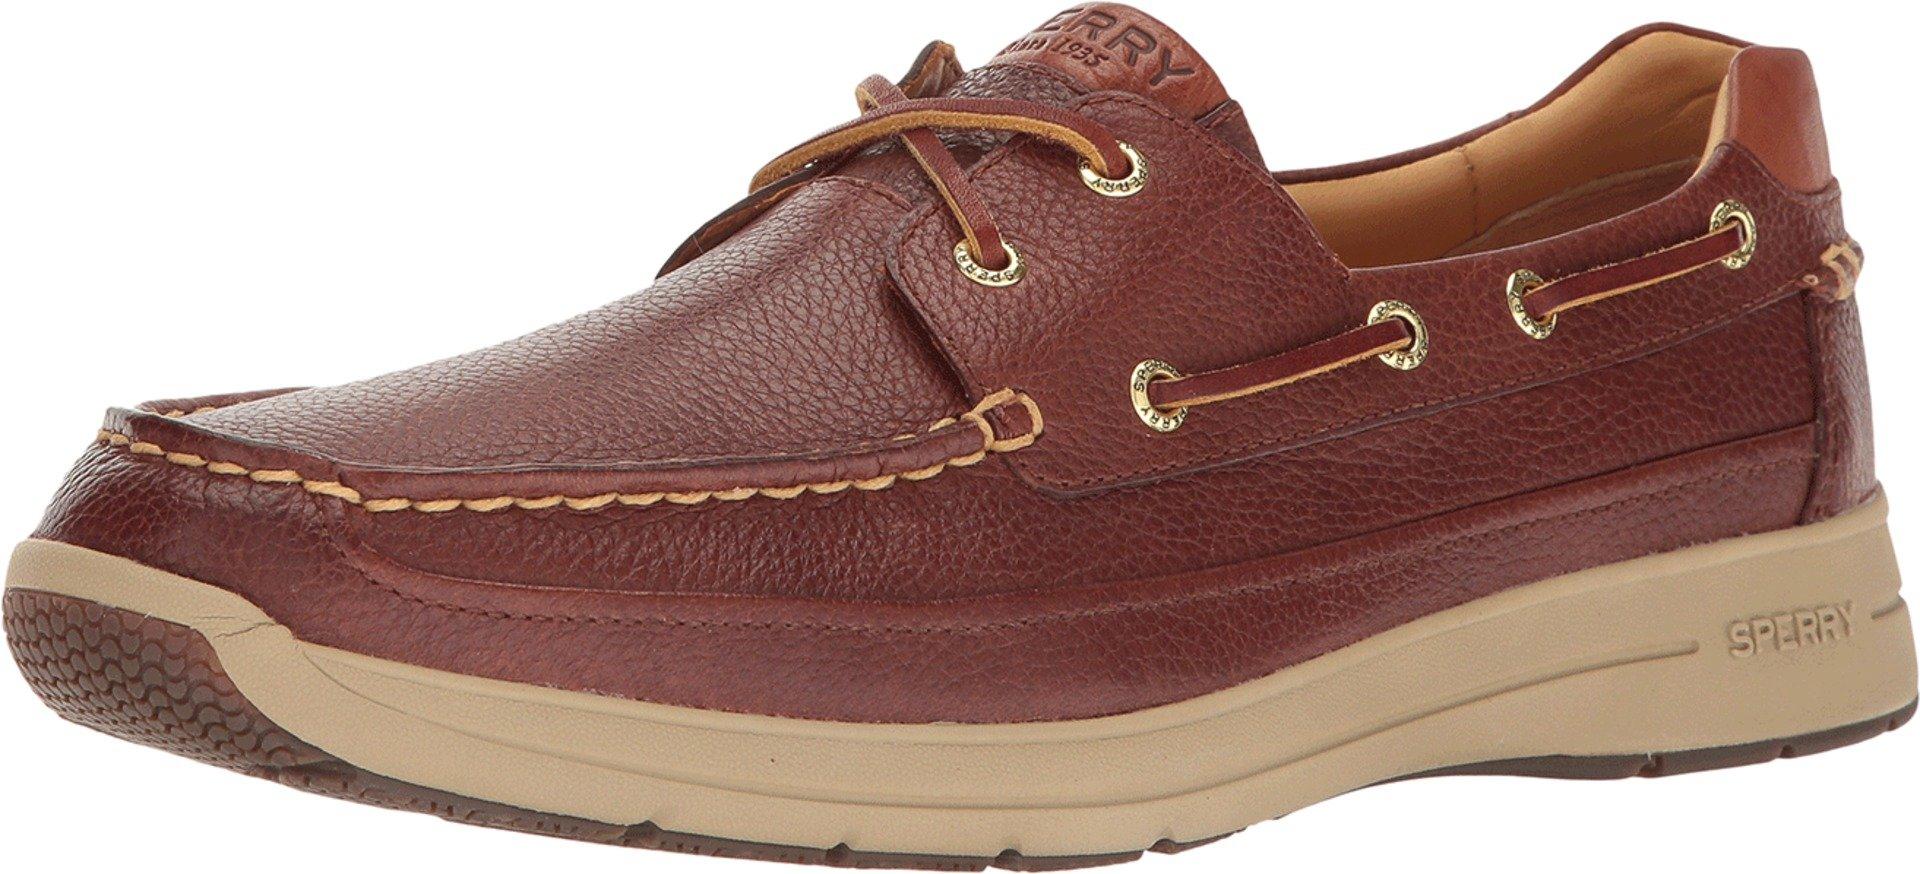 Sperry Men's Gold Cup Ultra Boat Shoe (8.5 D(M) US, Cognac)